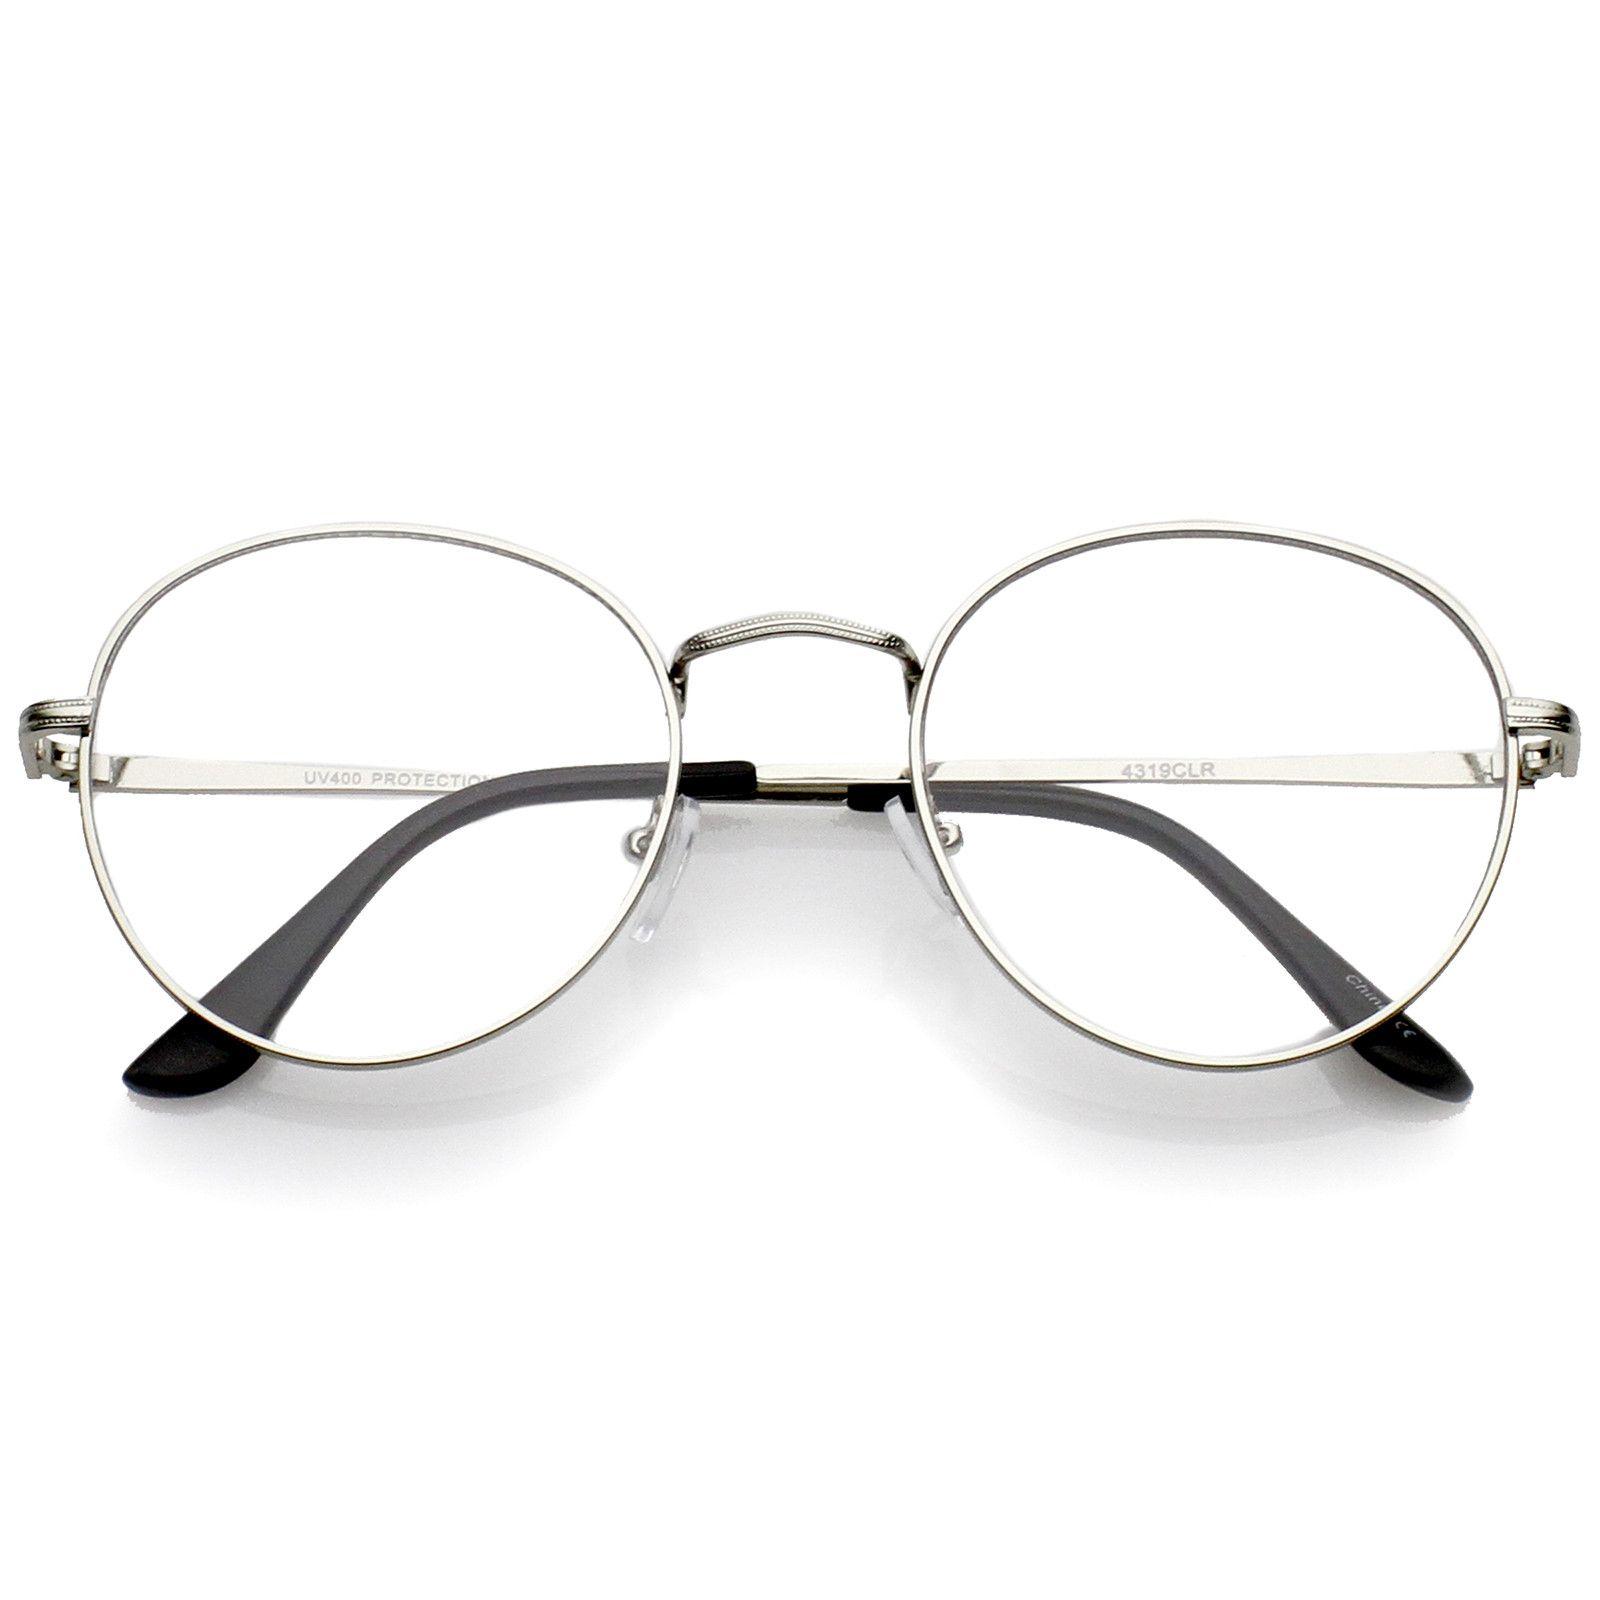 Classic Slim Metal Frame Clear Flat Lens Round Eyeglasses 52mm Vintage Eye Glasses Eyeglasses For Women Round Metal Glasses